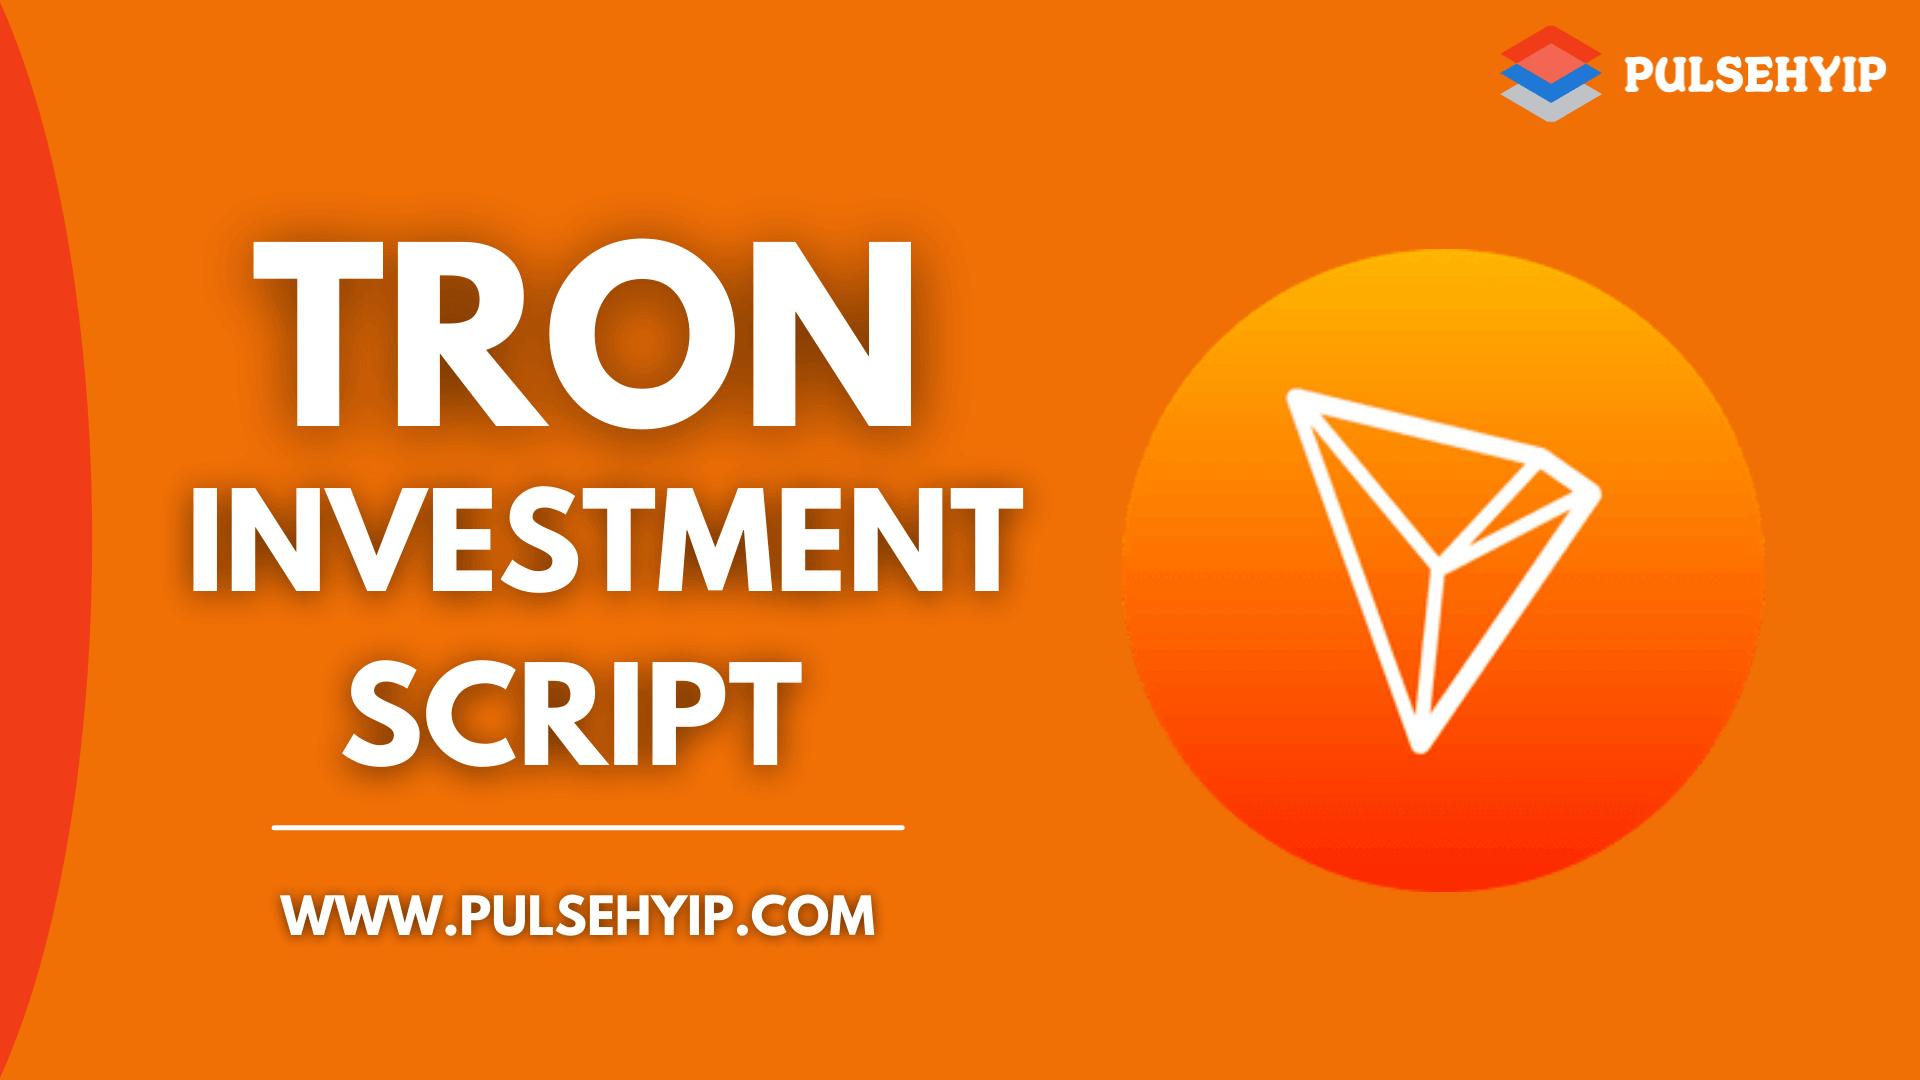 Best Tron Investment Script to Build TRON Based Investment Platform